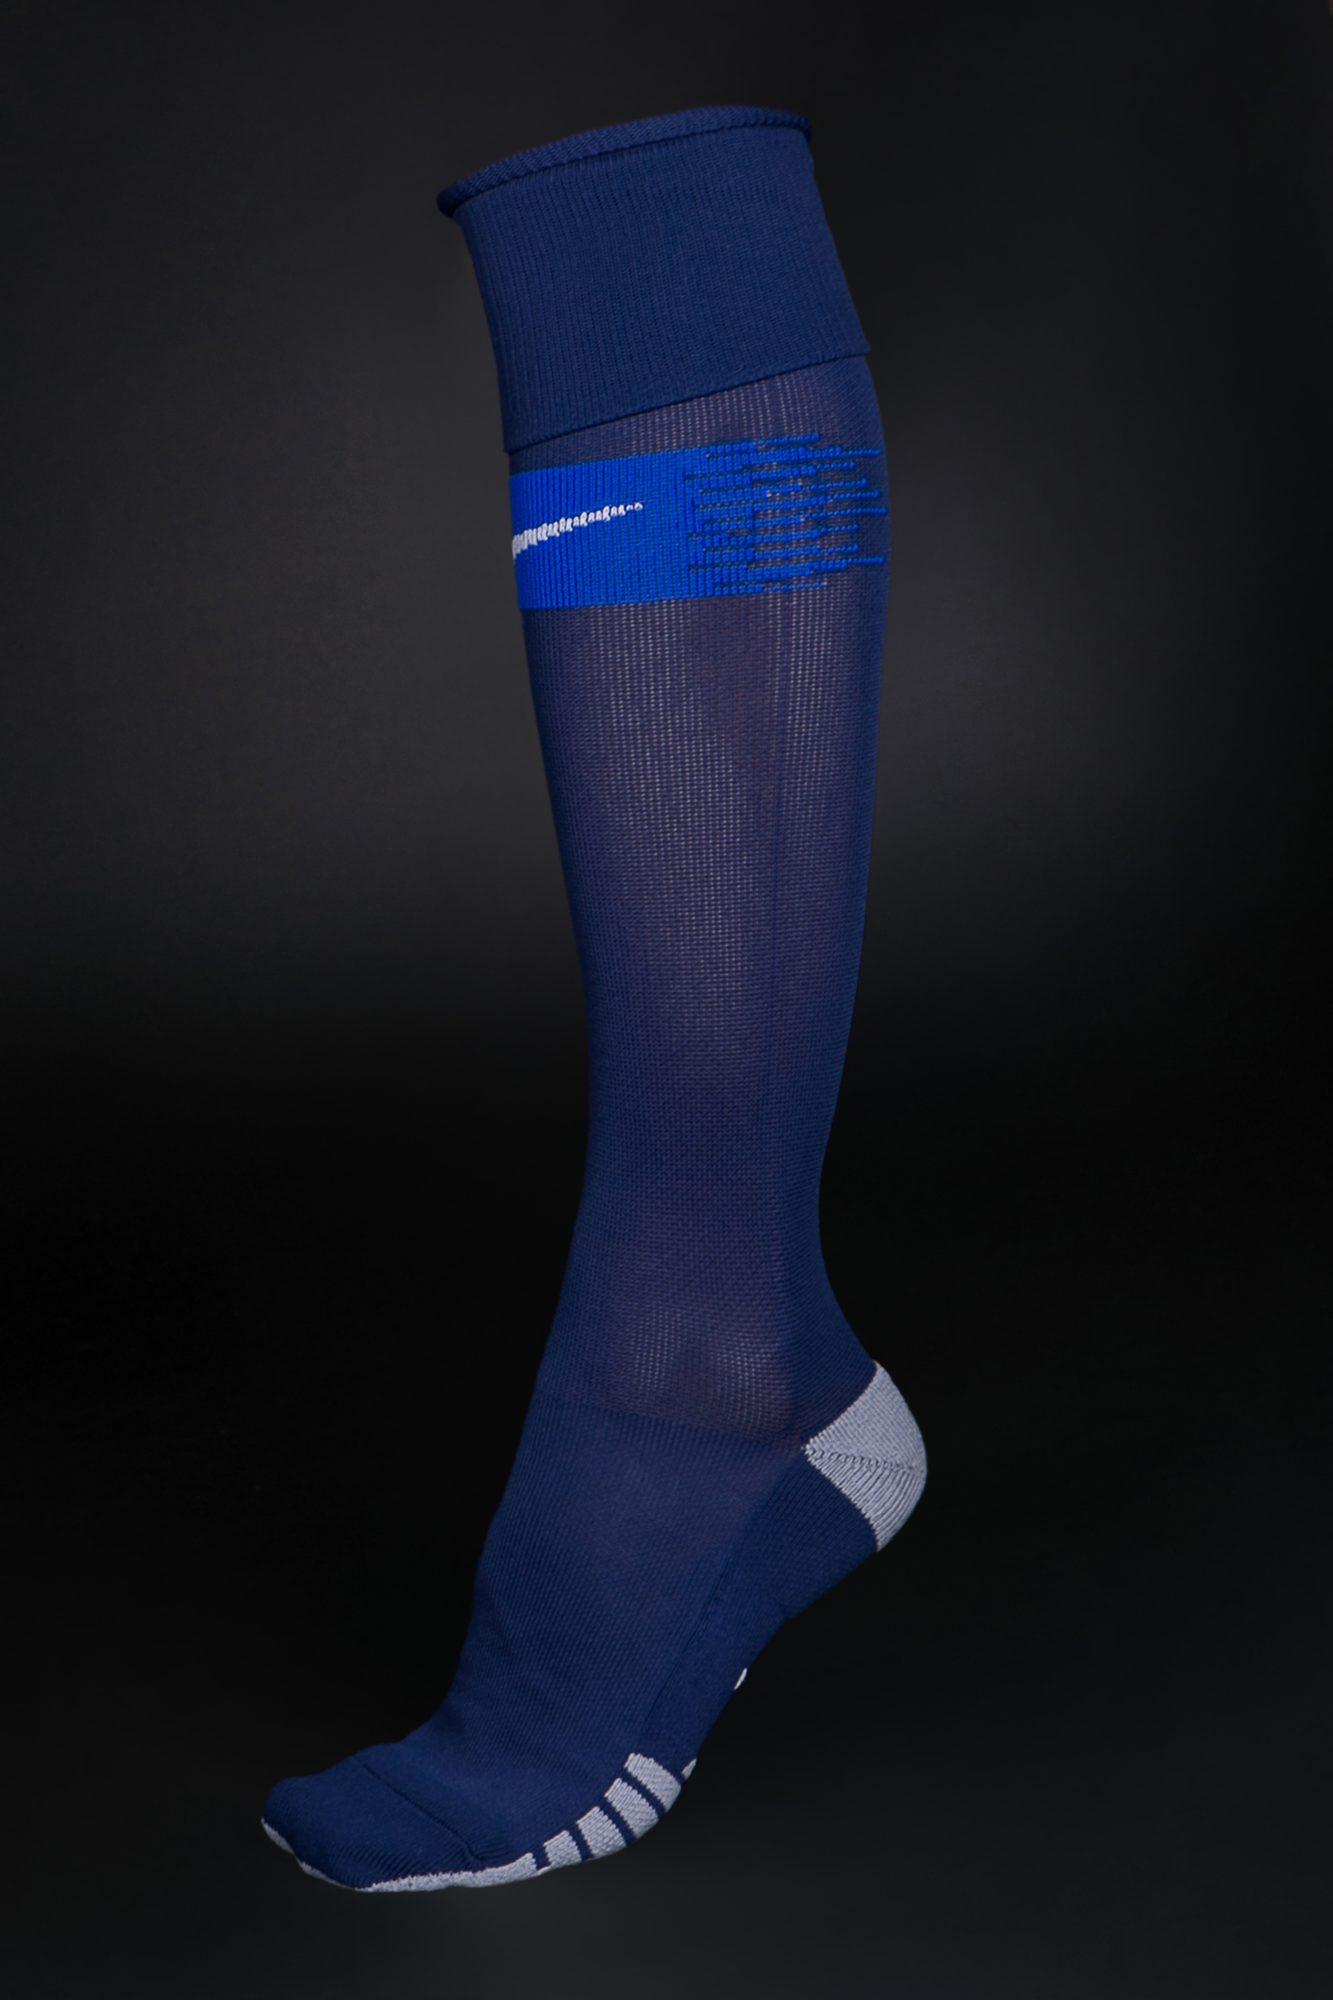 b22c4b199 Гетры Nike Team MatchFit Over-the-Calf Football Socks купить в ...